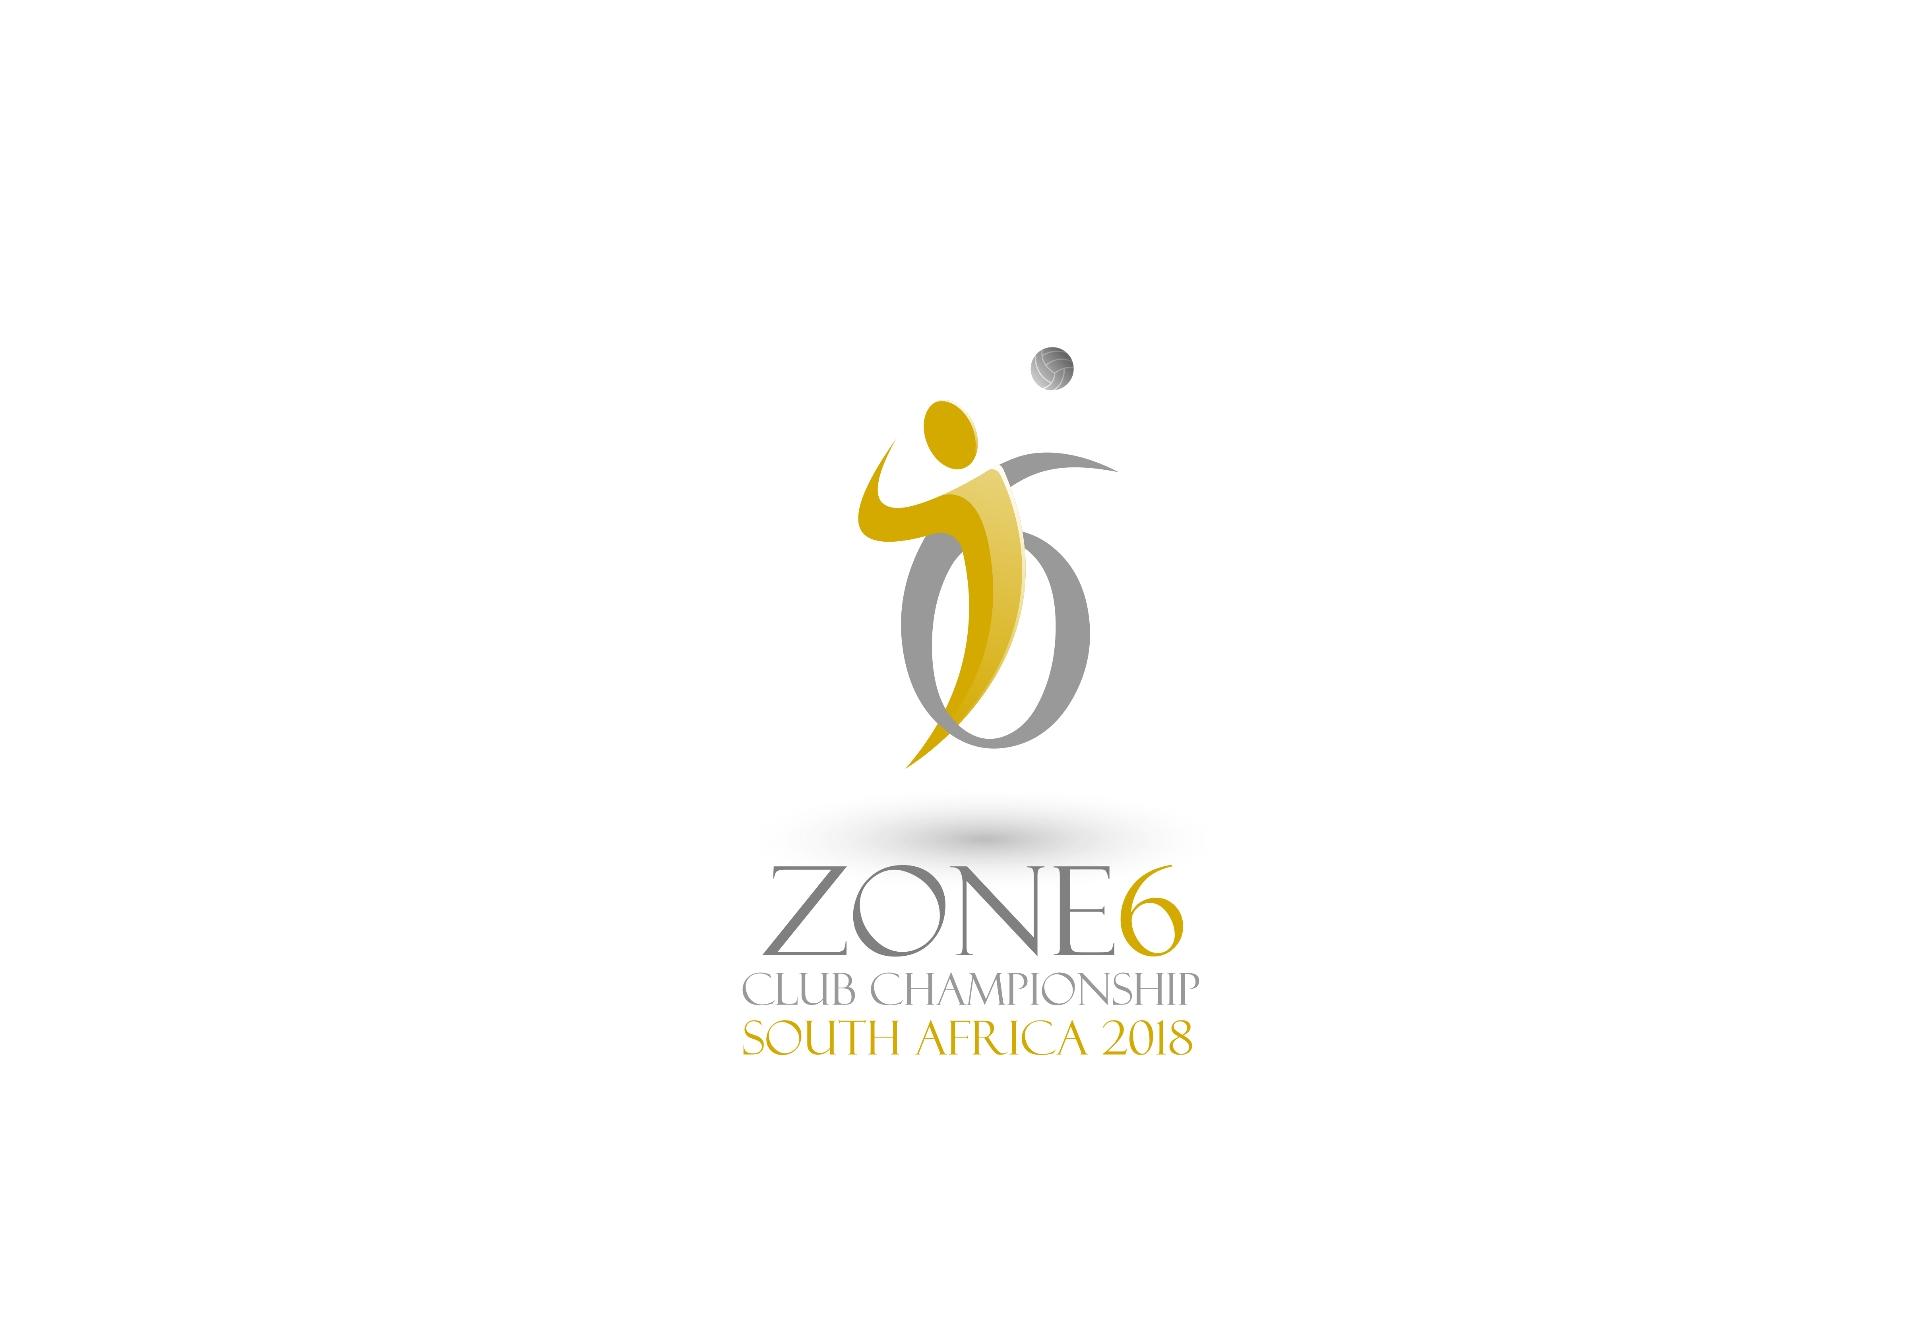 Zone 6 Volleyball Club Championship